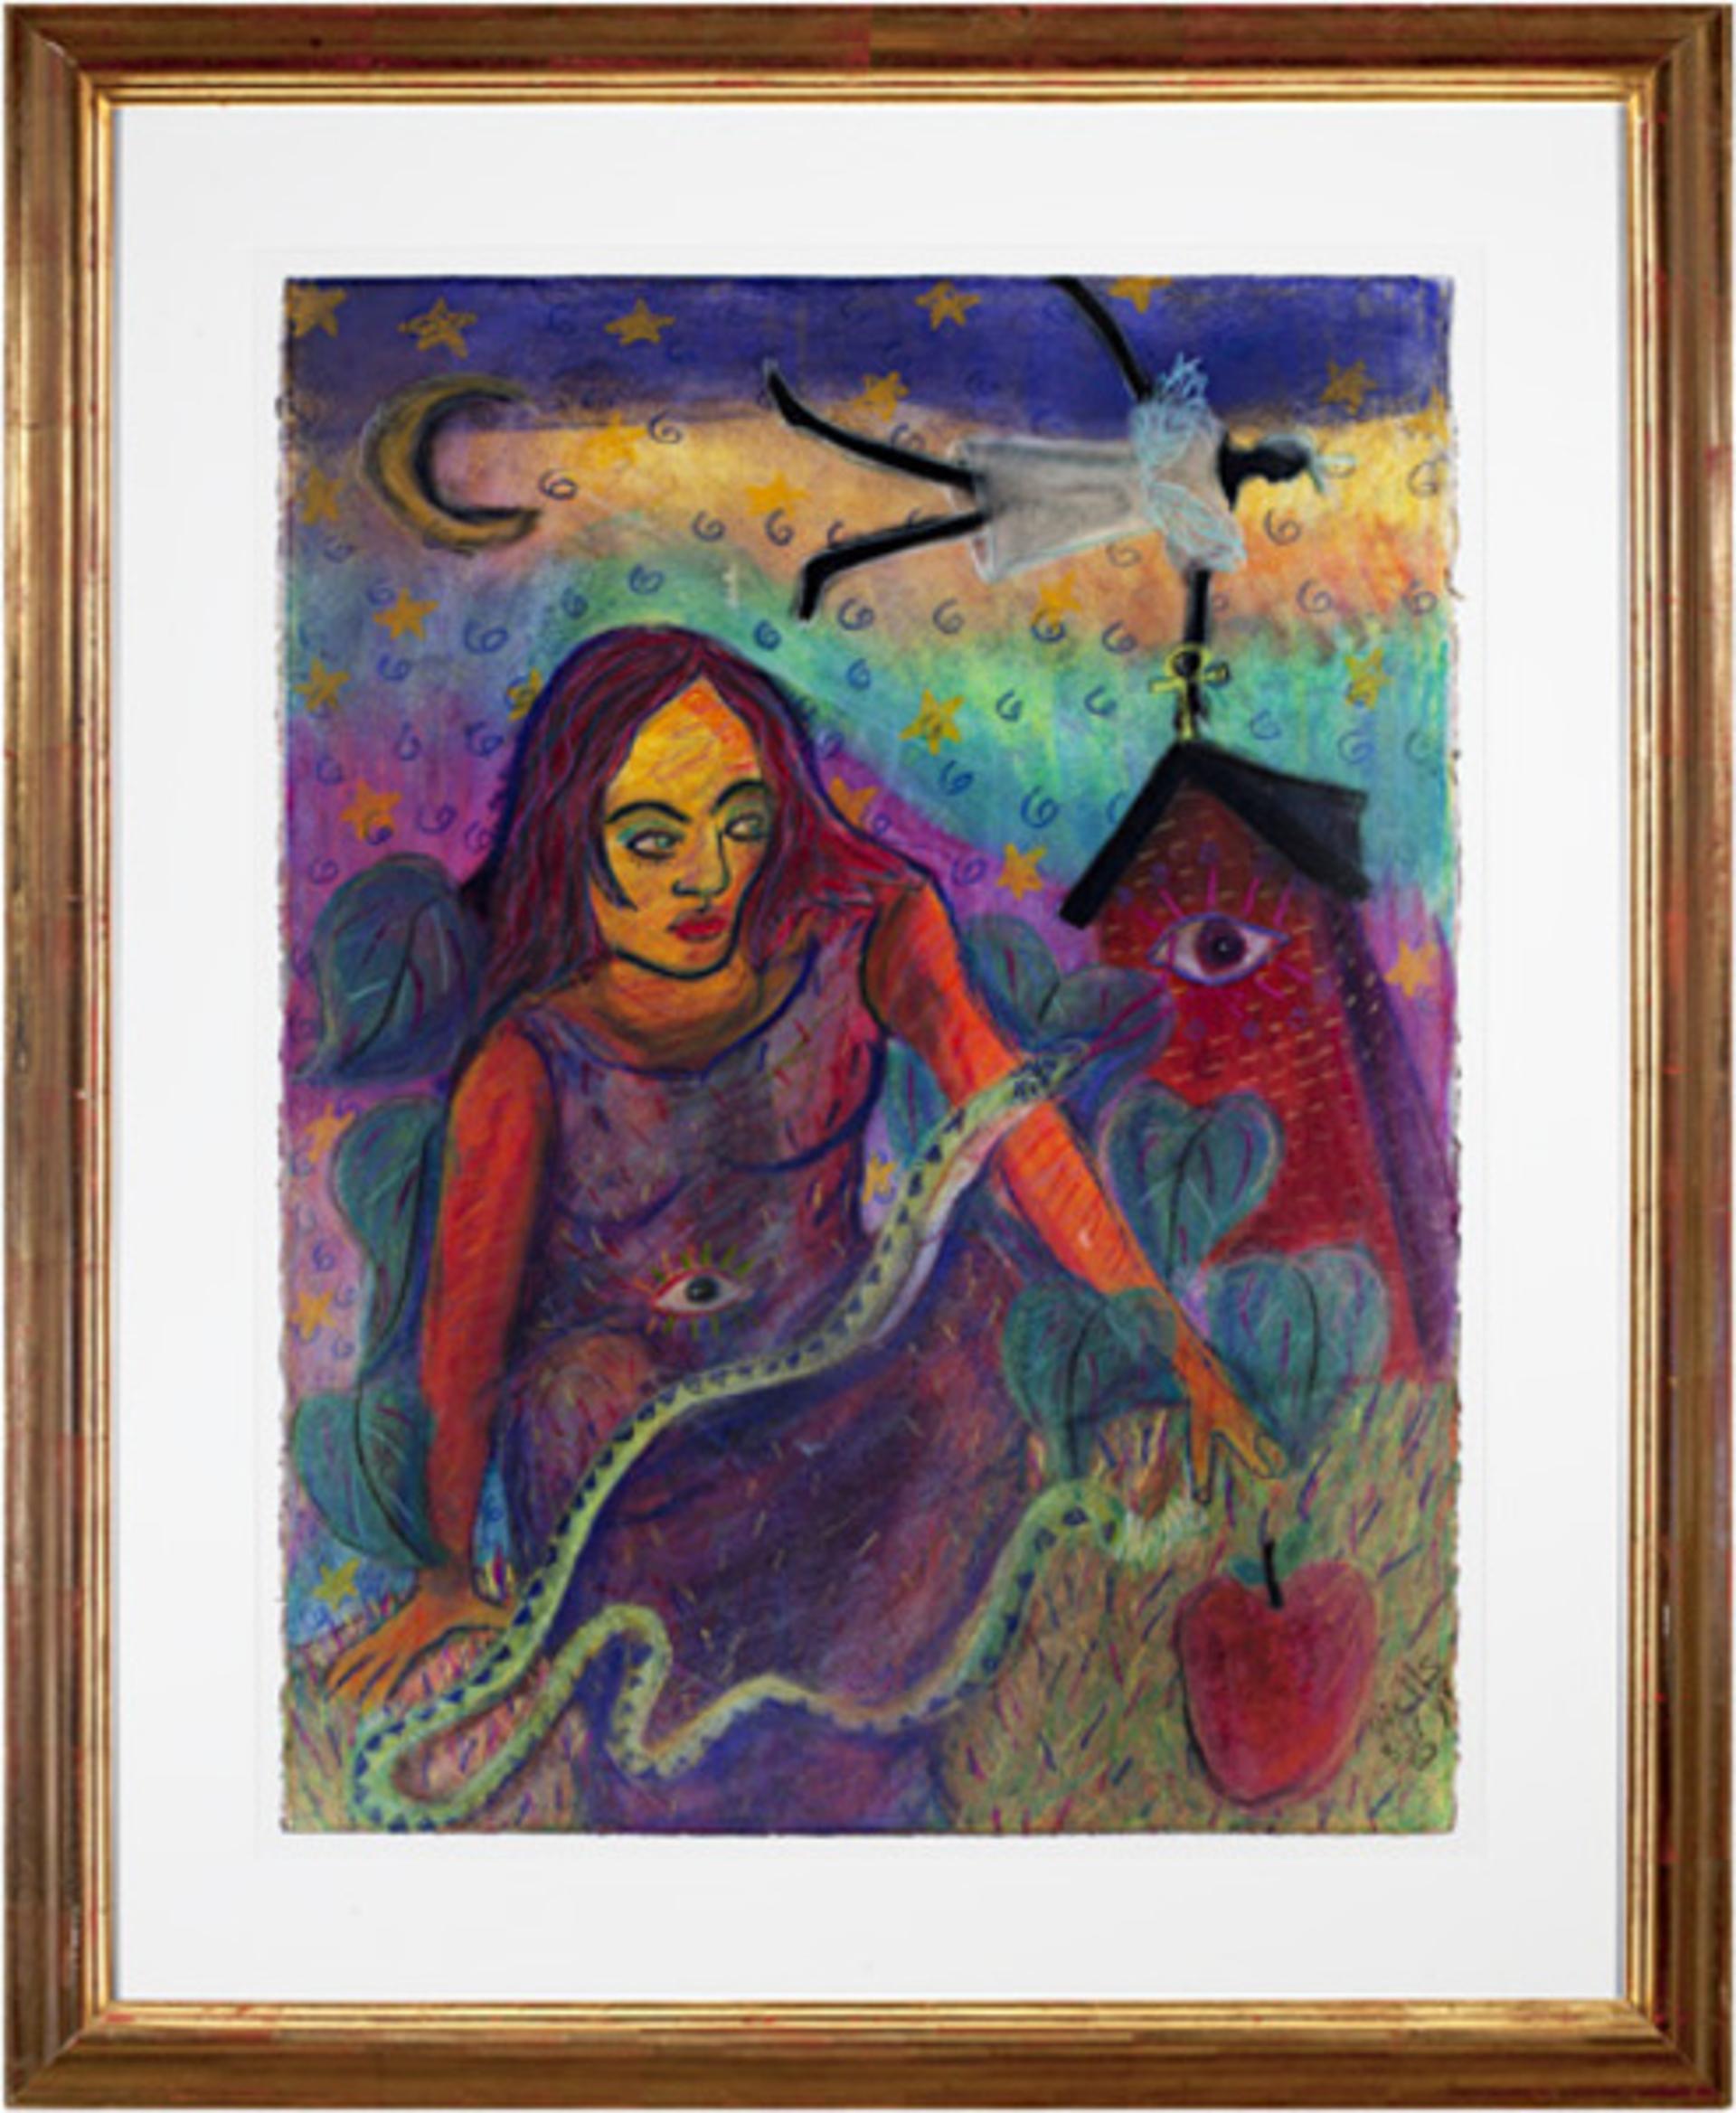 Spiritual Bounds by Della Wells